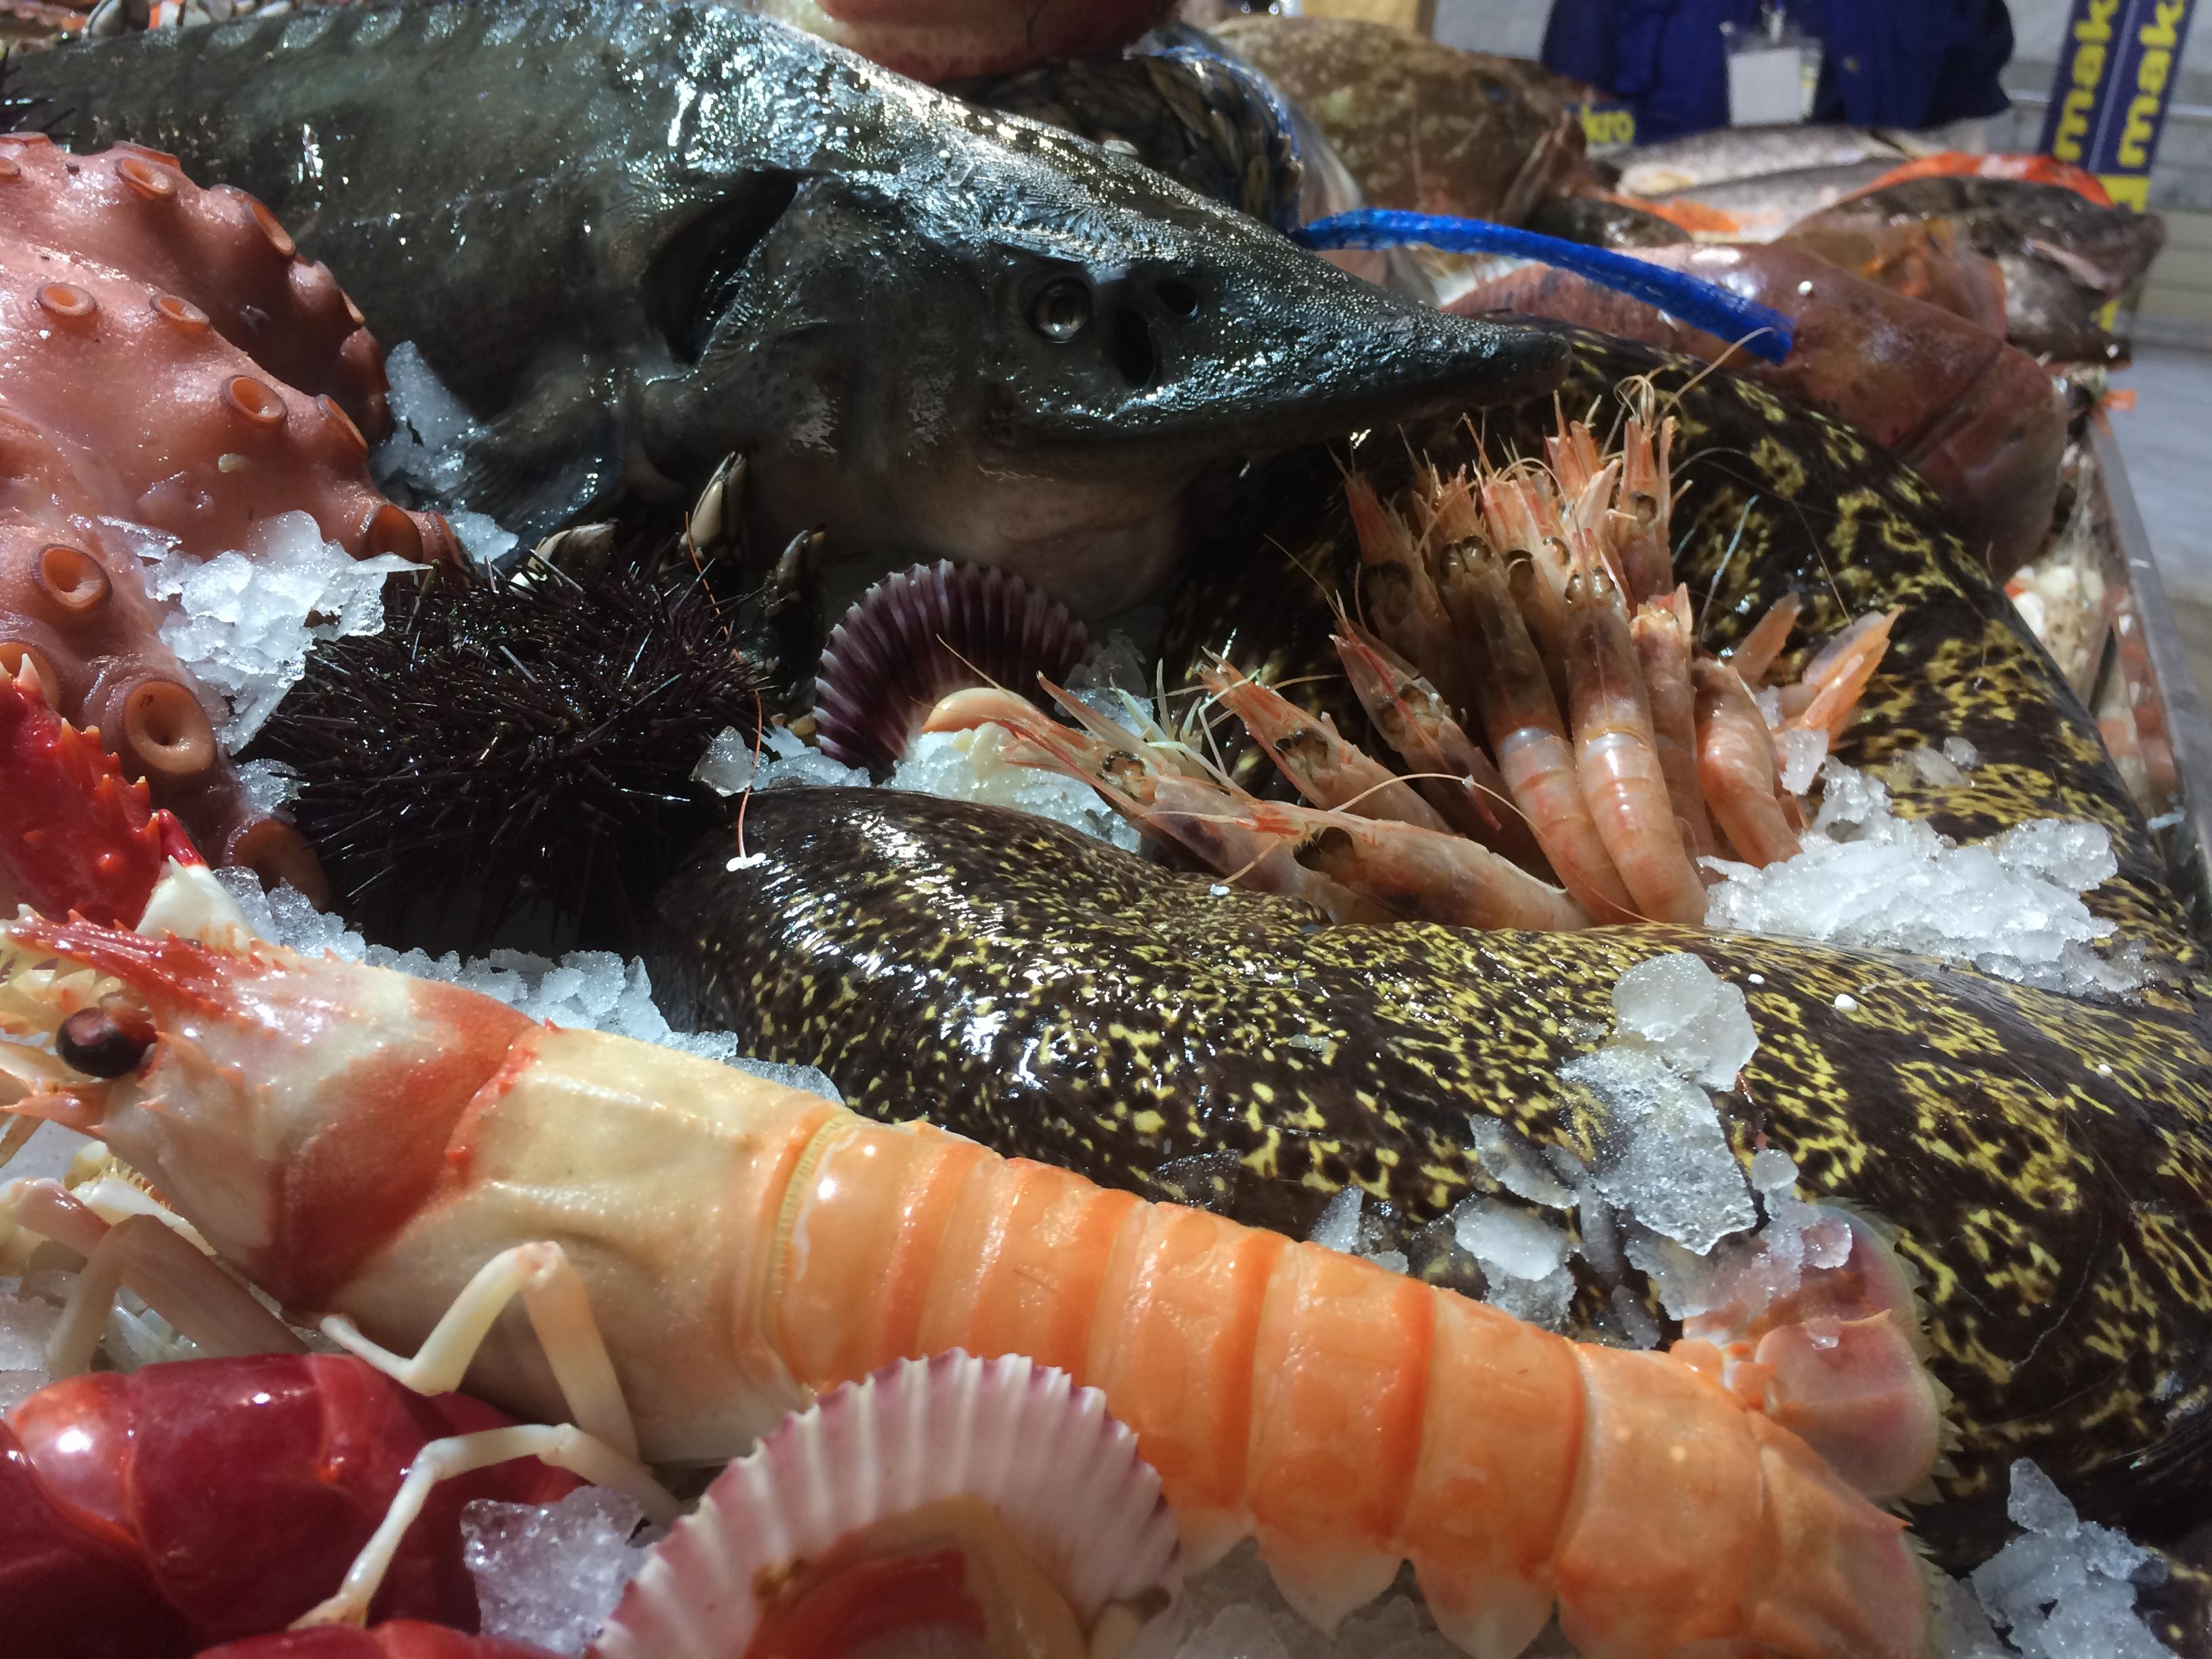 Fresh seafood is plentiful in food markets in Madrid